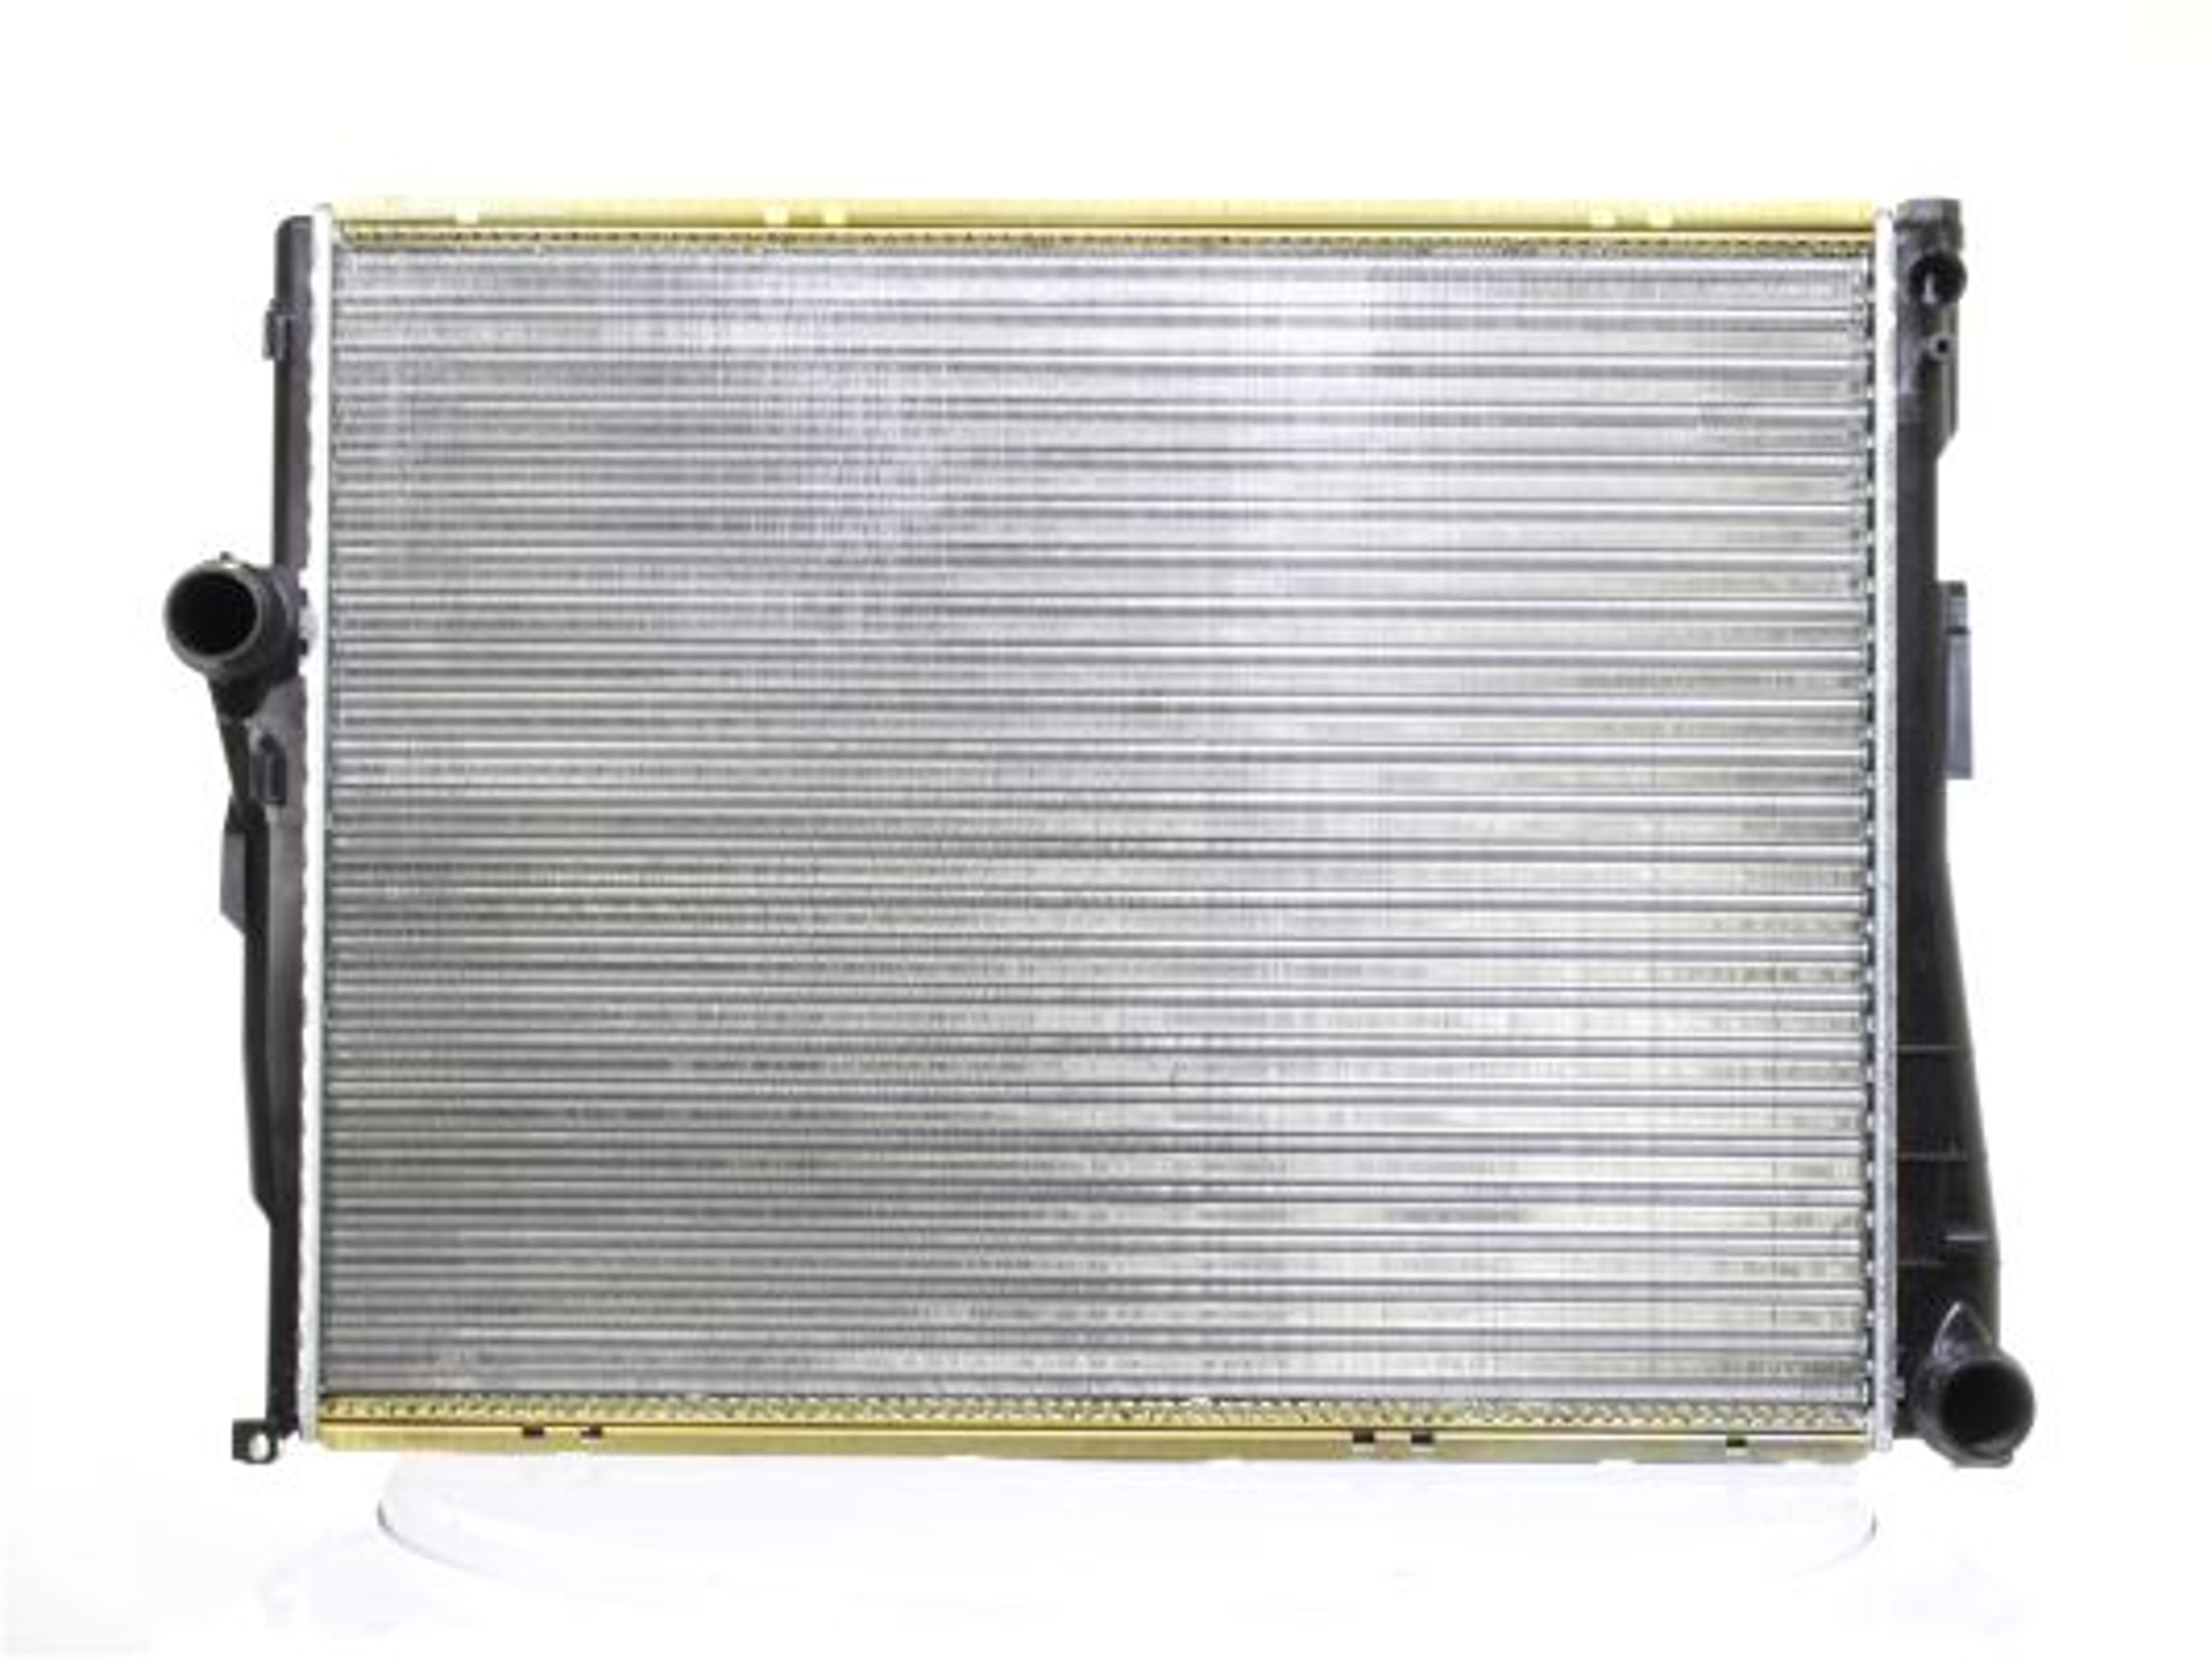 ALANKO | Kühler, Motorkühlung 10530448